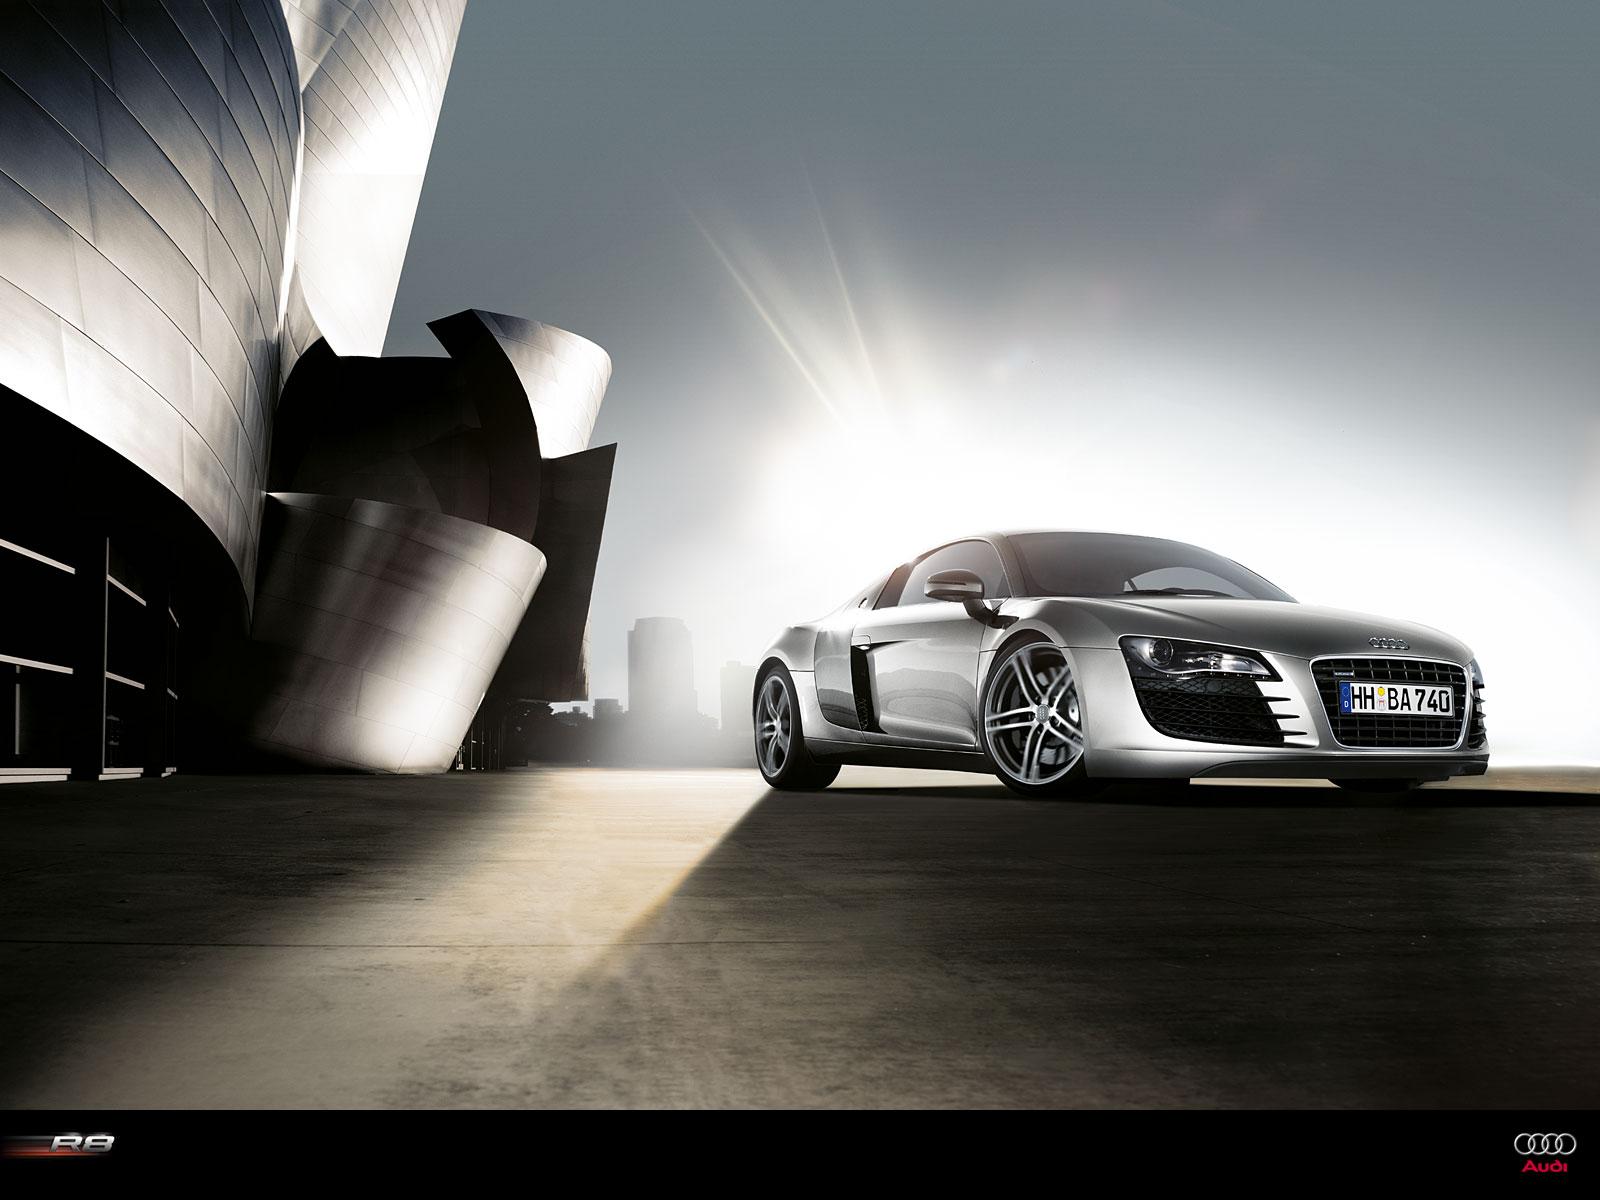 Cars HD Wallpapers Audi R8 Exotic Car HD Wallpaper 1600x1200